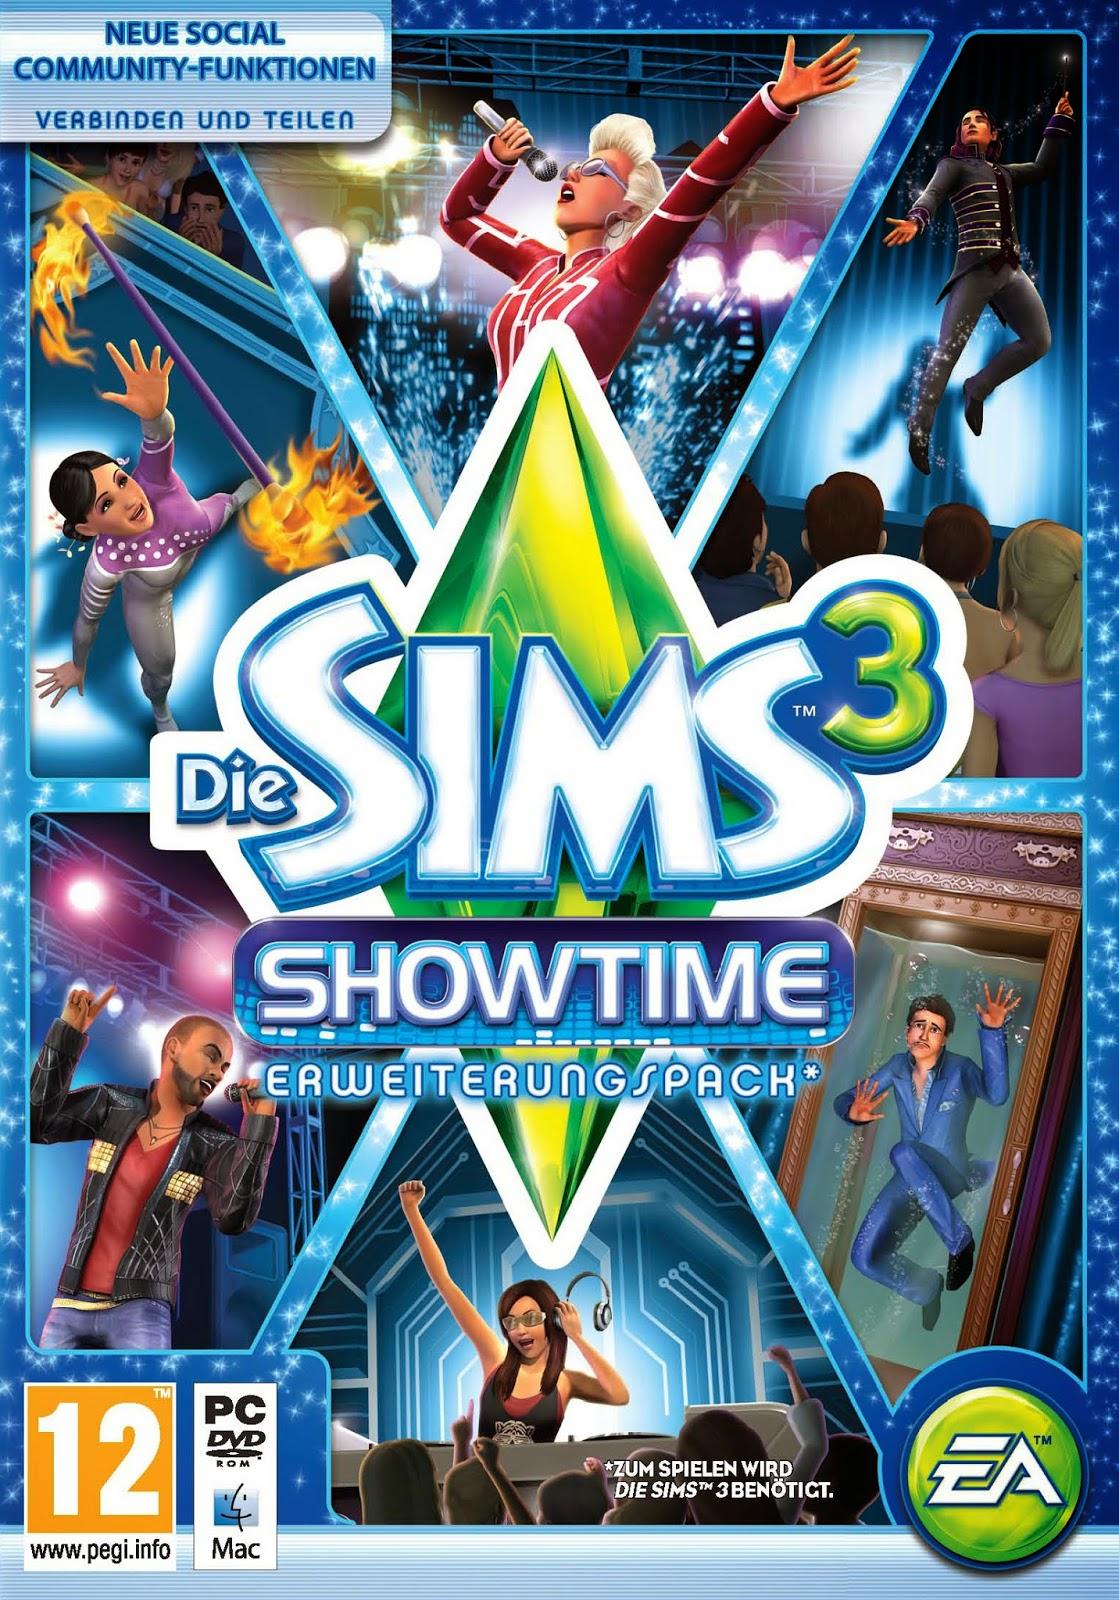 http://www.amazon.de/Die-Sims-Showtime-Add-On/dp/B006IPBV7M/ref=sr_1_1?ie=UTF8&qid=1406037210&sr=8-1&keywords=Die+Sims+3+-+Showtime